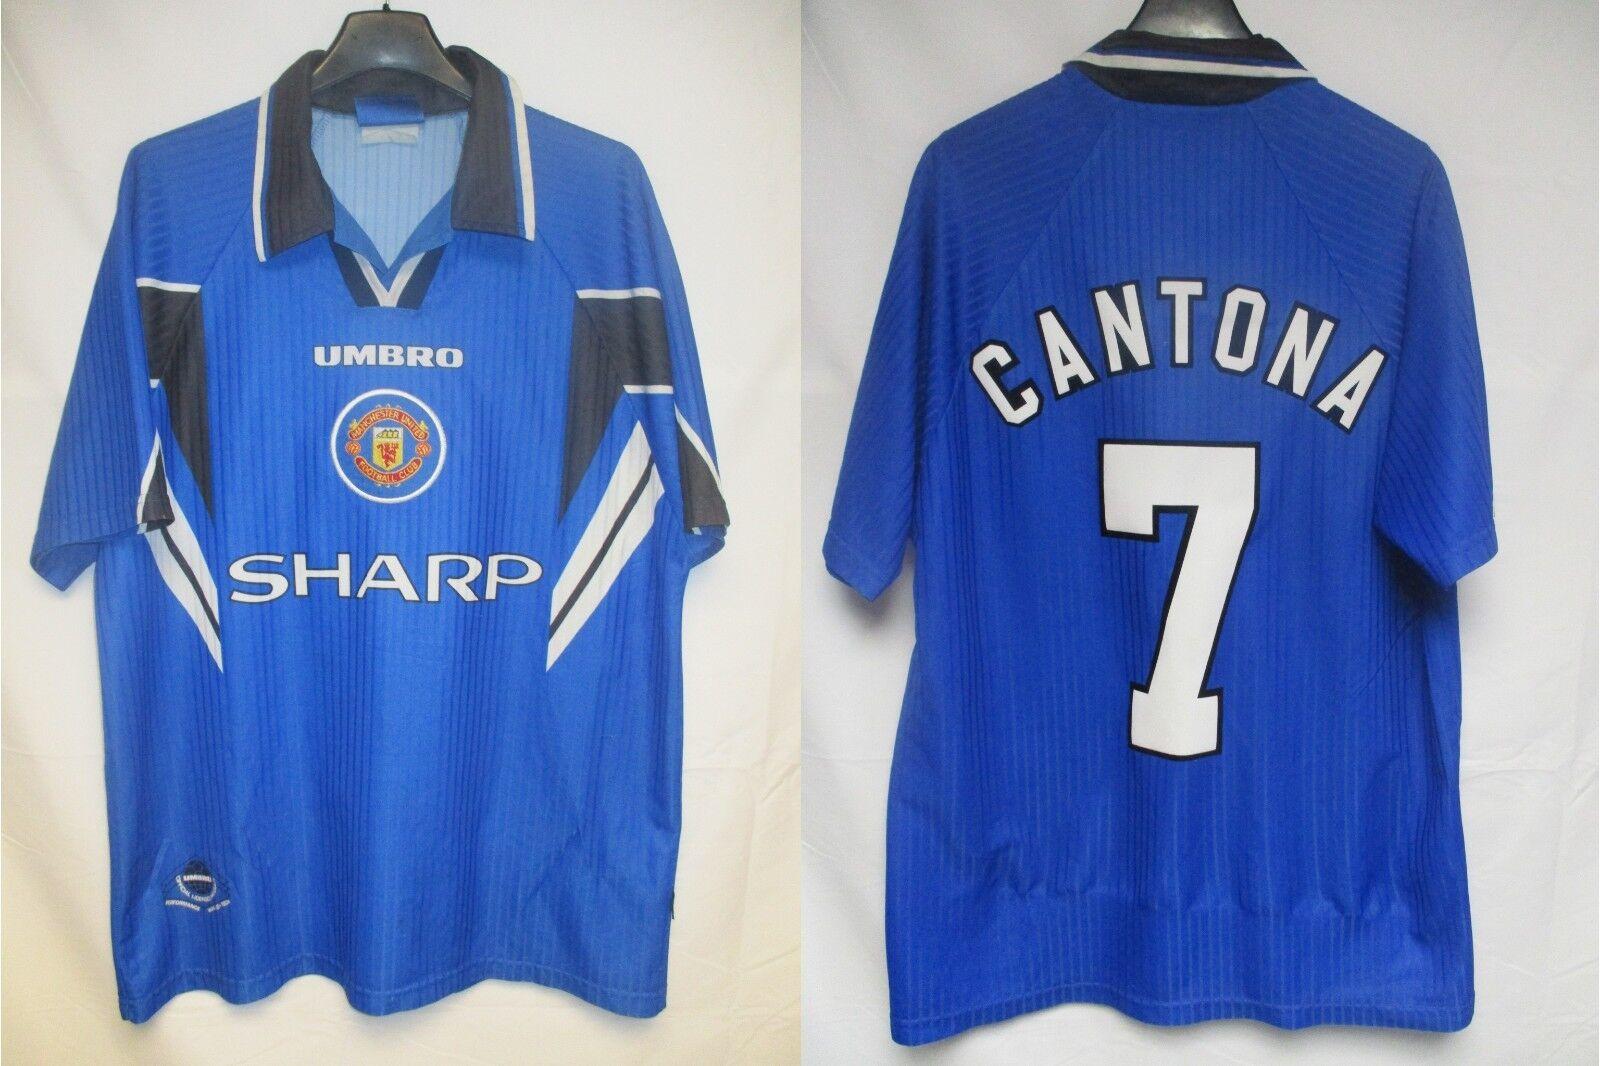 Maillot MANCHESTER UNITED CANTONA n°7 UMBRO shirt jersey  trikot vintage 1997 L  acquisti online